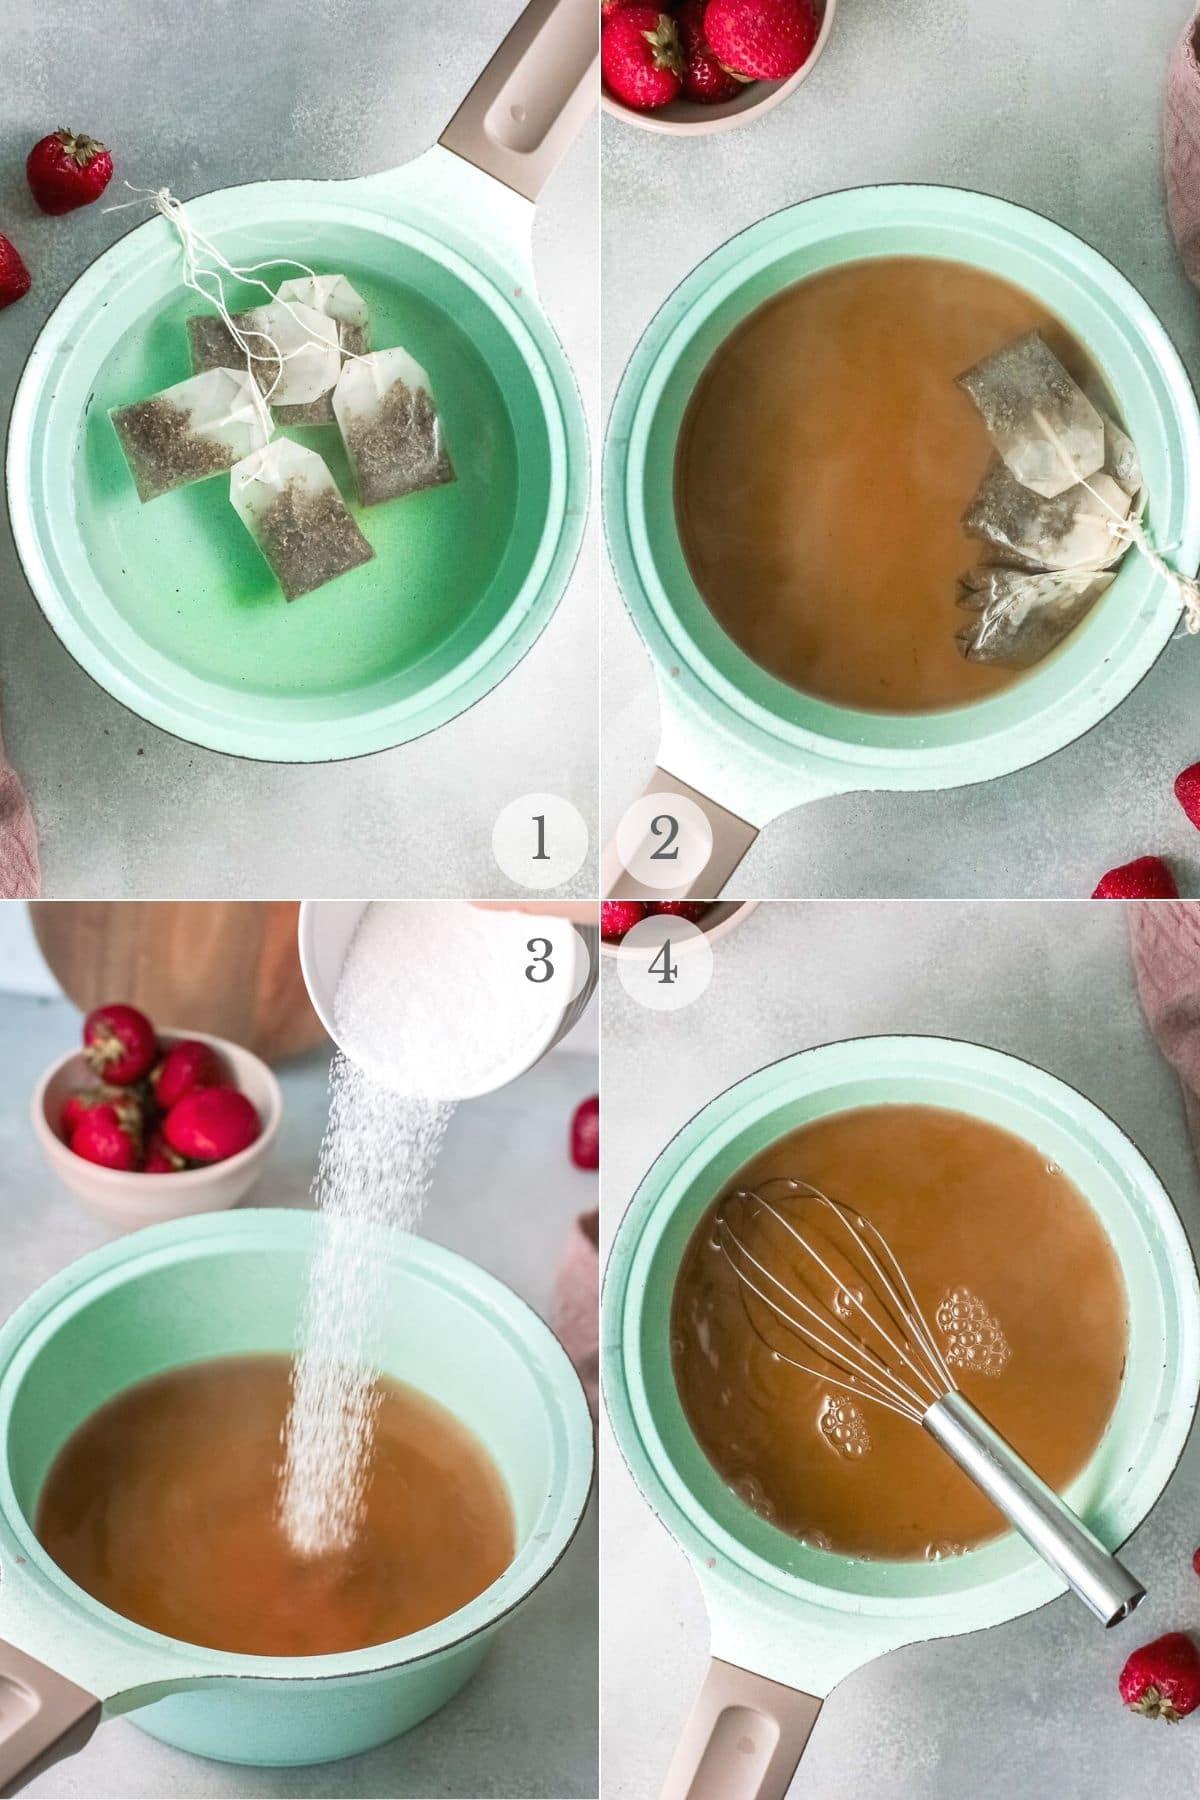 sweet tea recipe steps 1-4